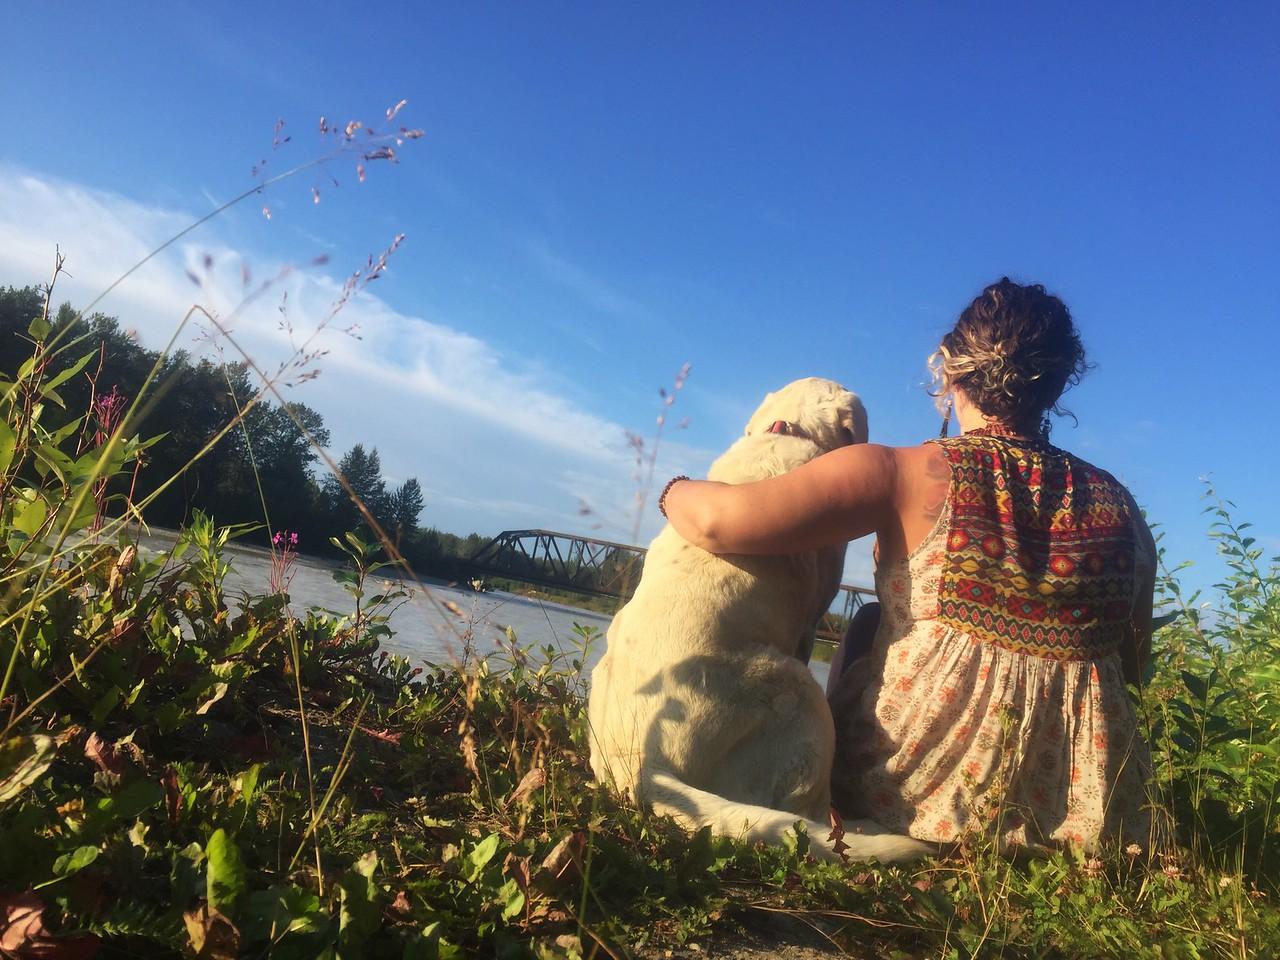 Day 51 | August 5. 2015 | Talkeetna, Alaska